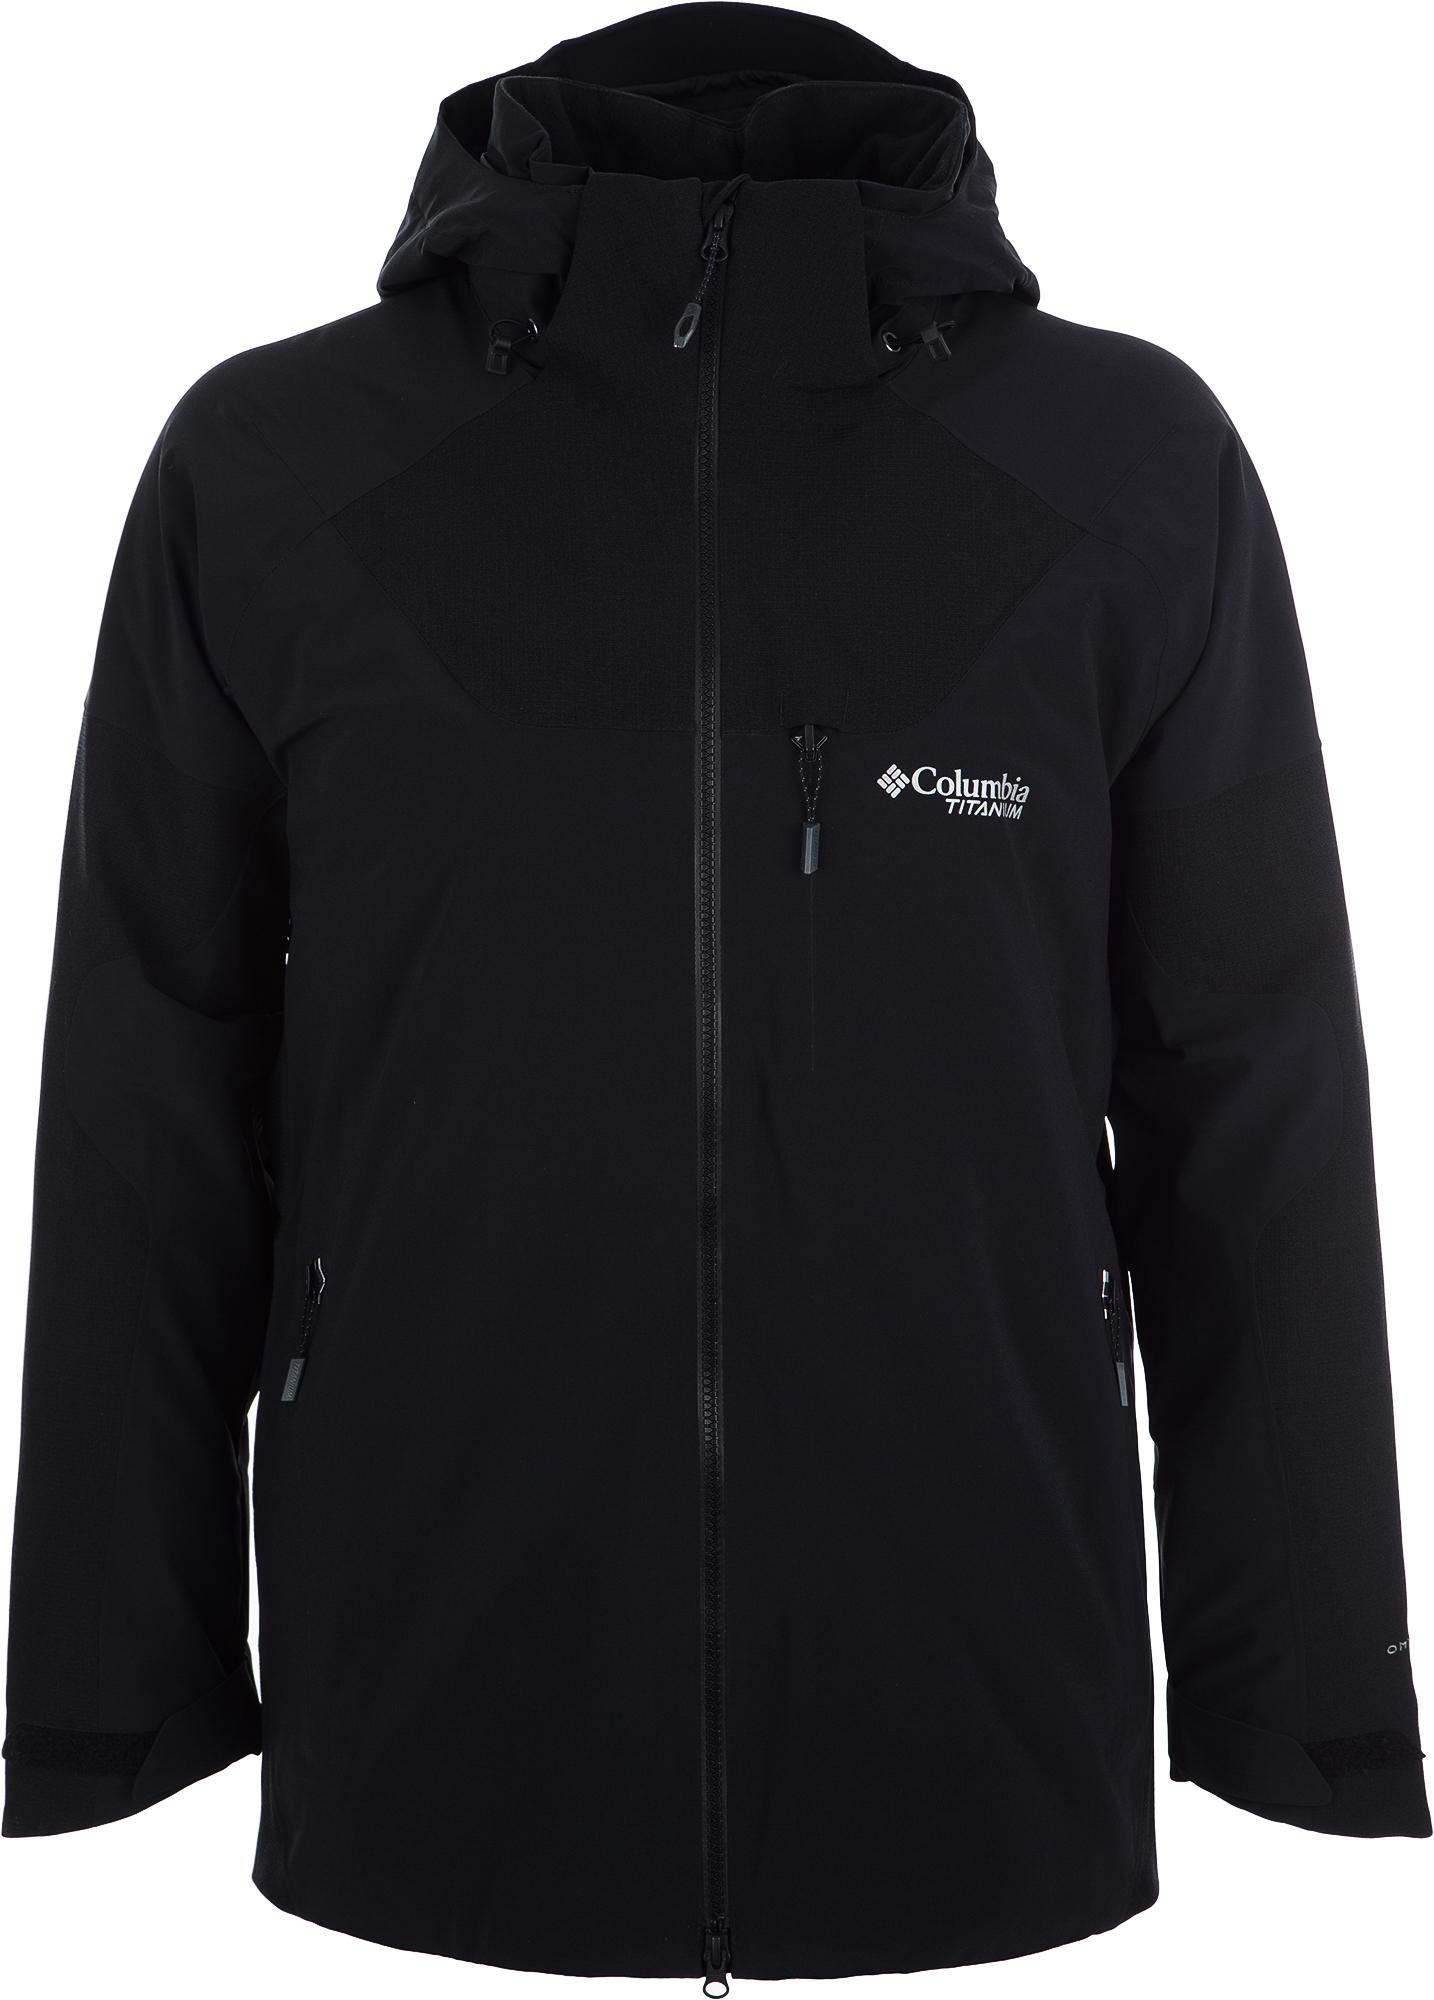 Columbia Куртка утепленная мужская Columbia Powder Keg II, размер 50-52